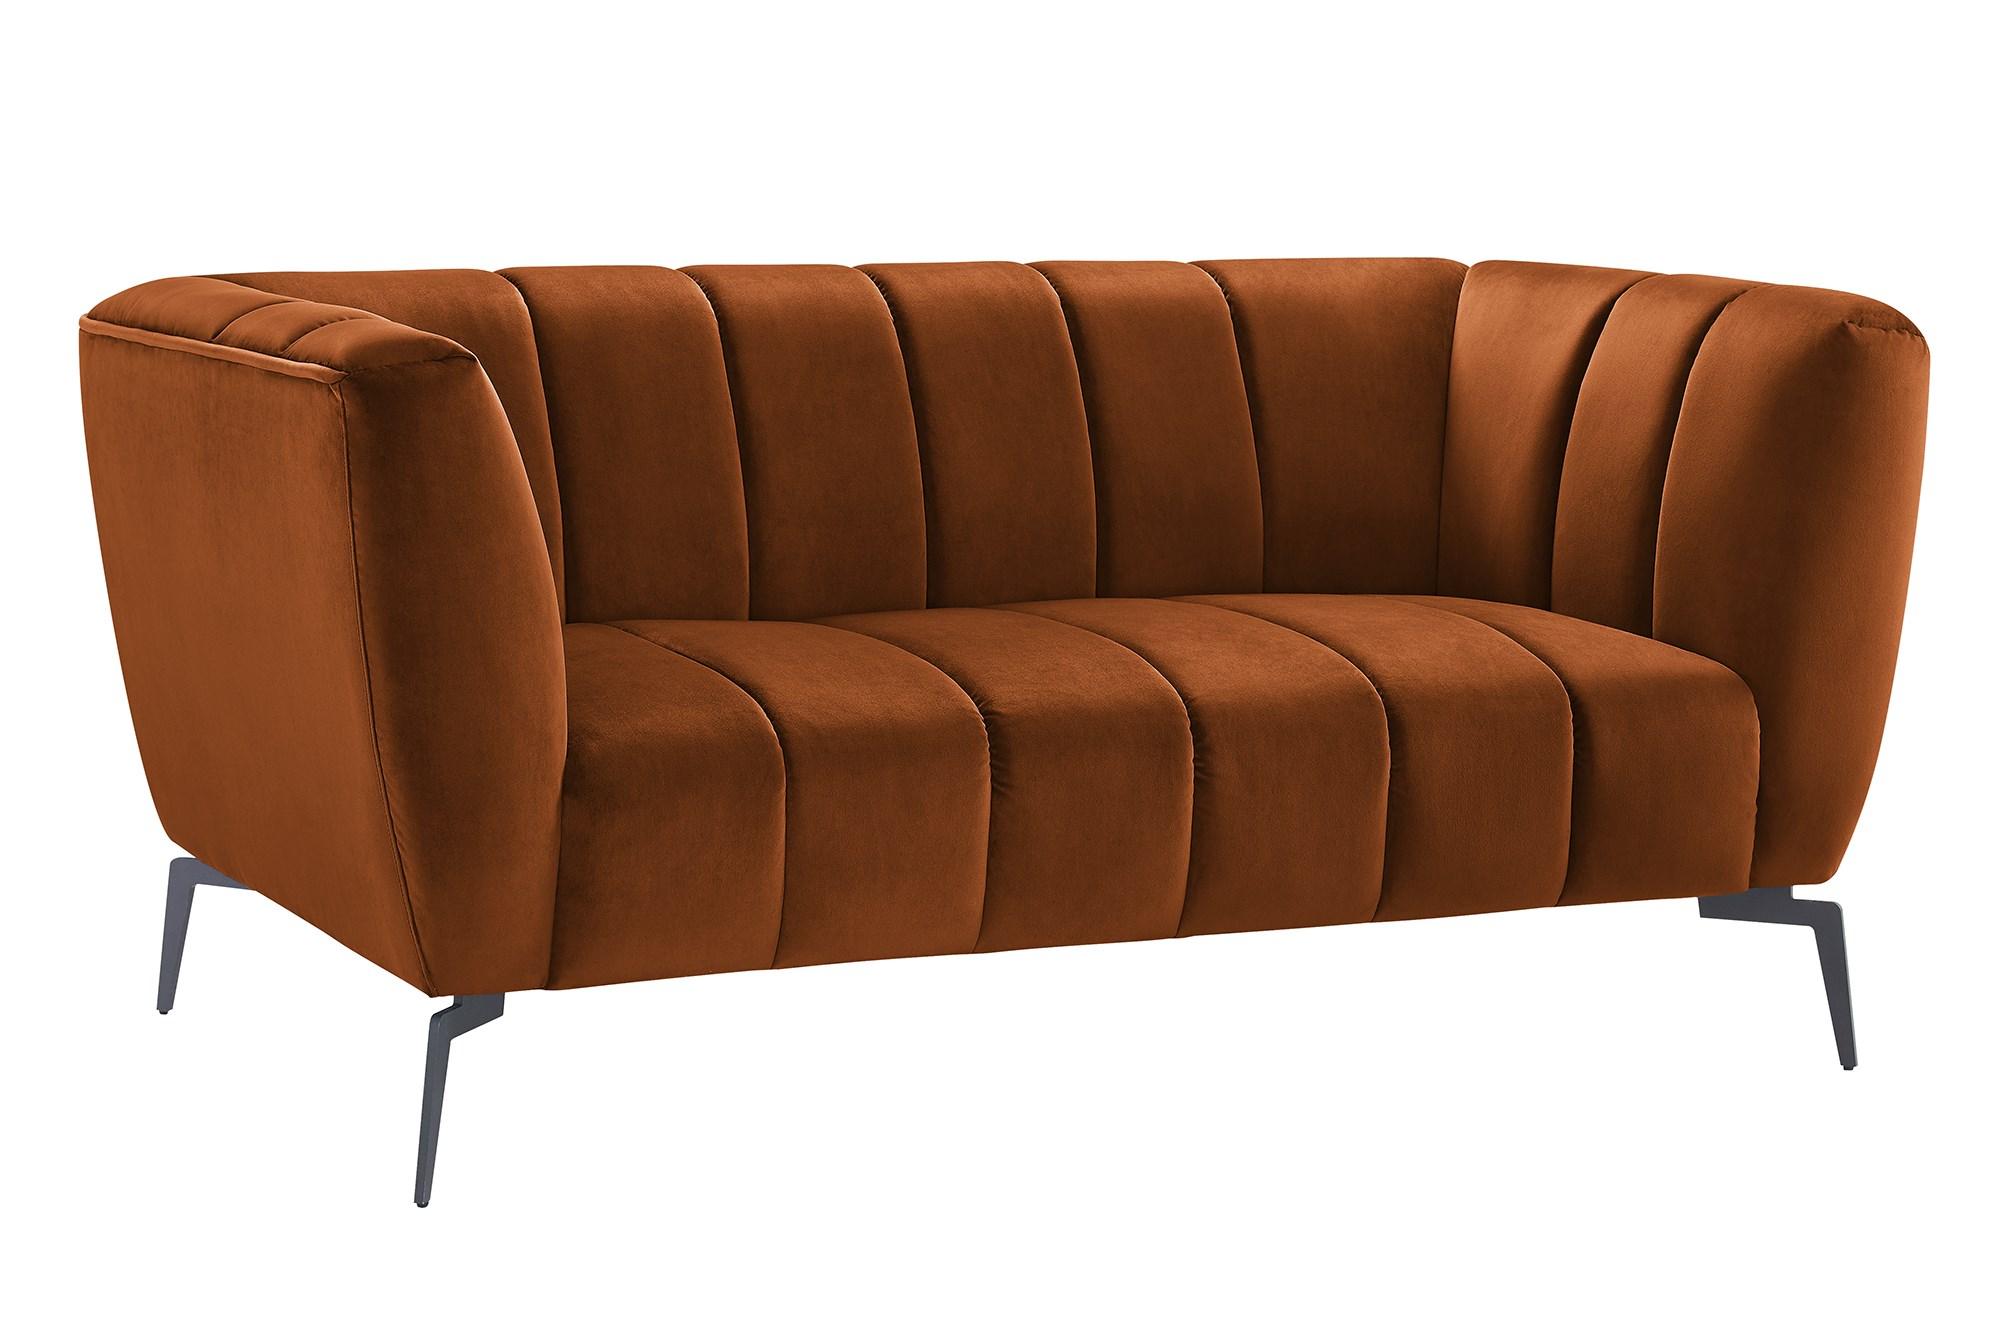 Køb Pavia 2 Personers Sofa I Bronzefarvet Velour Med Sorte Metalben